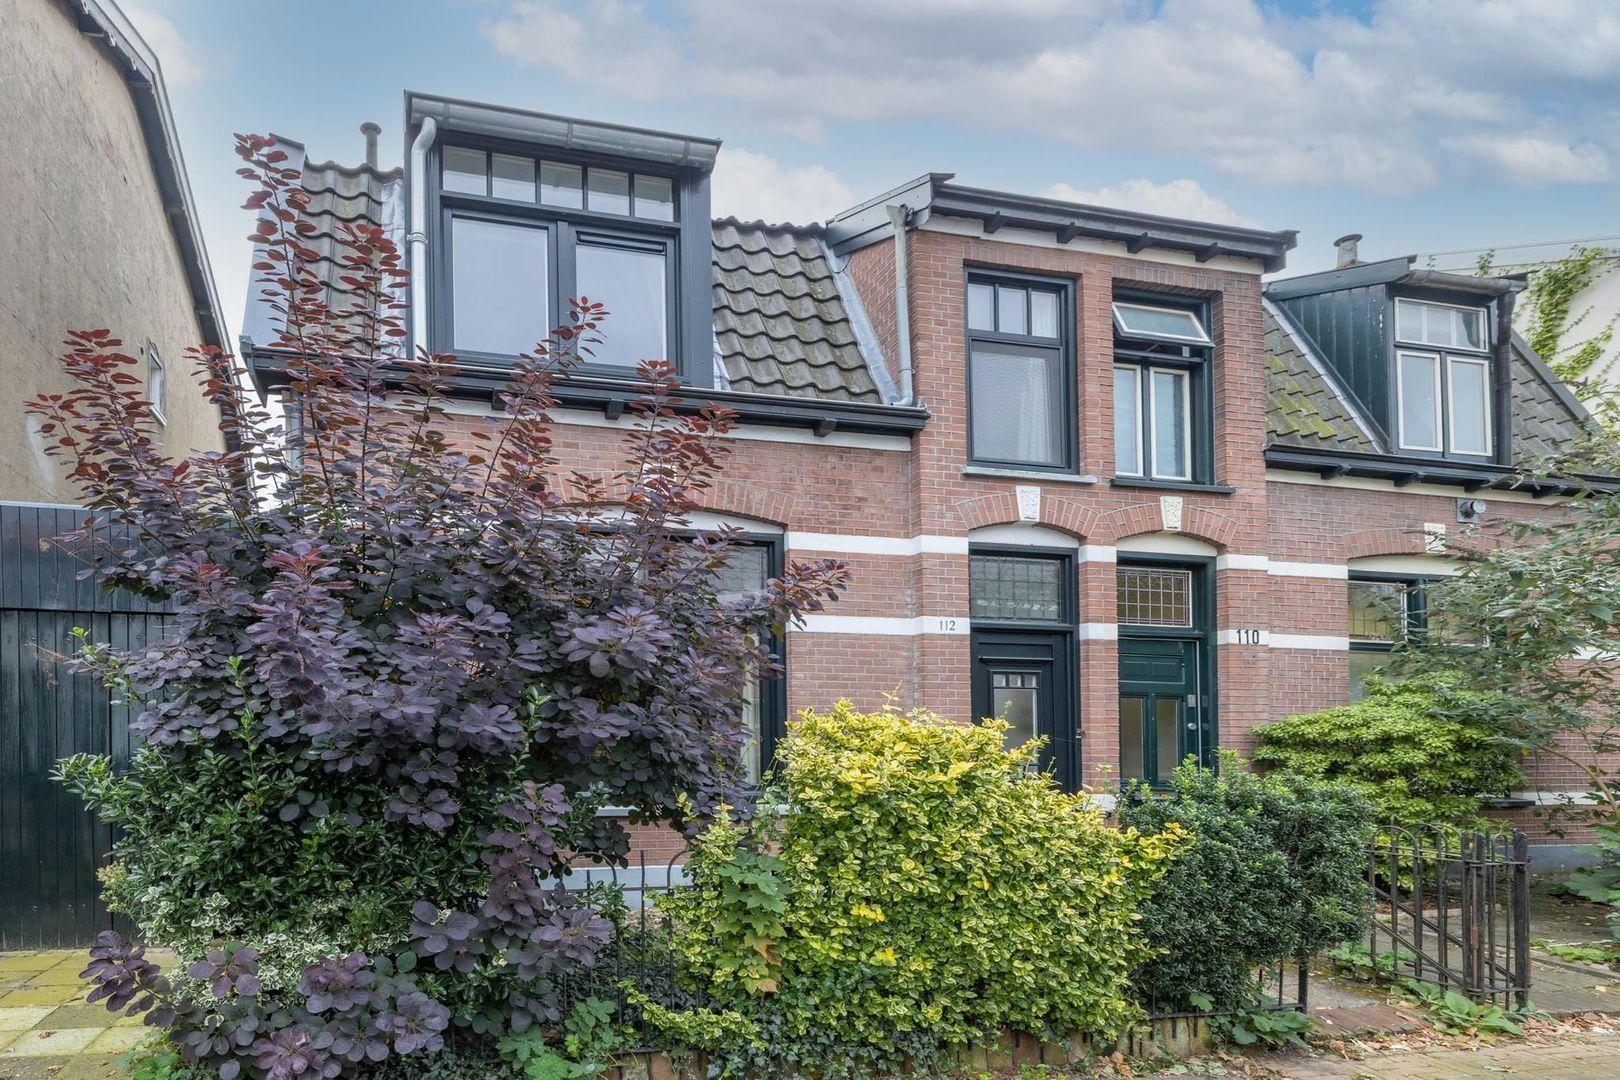 Violenstraat 112, Hilversum foto-1 blur